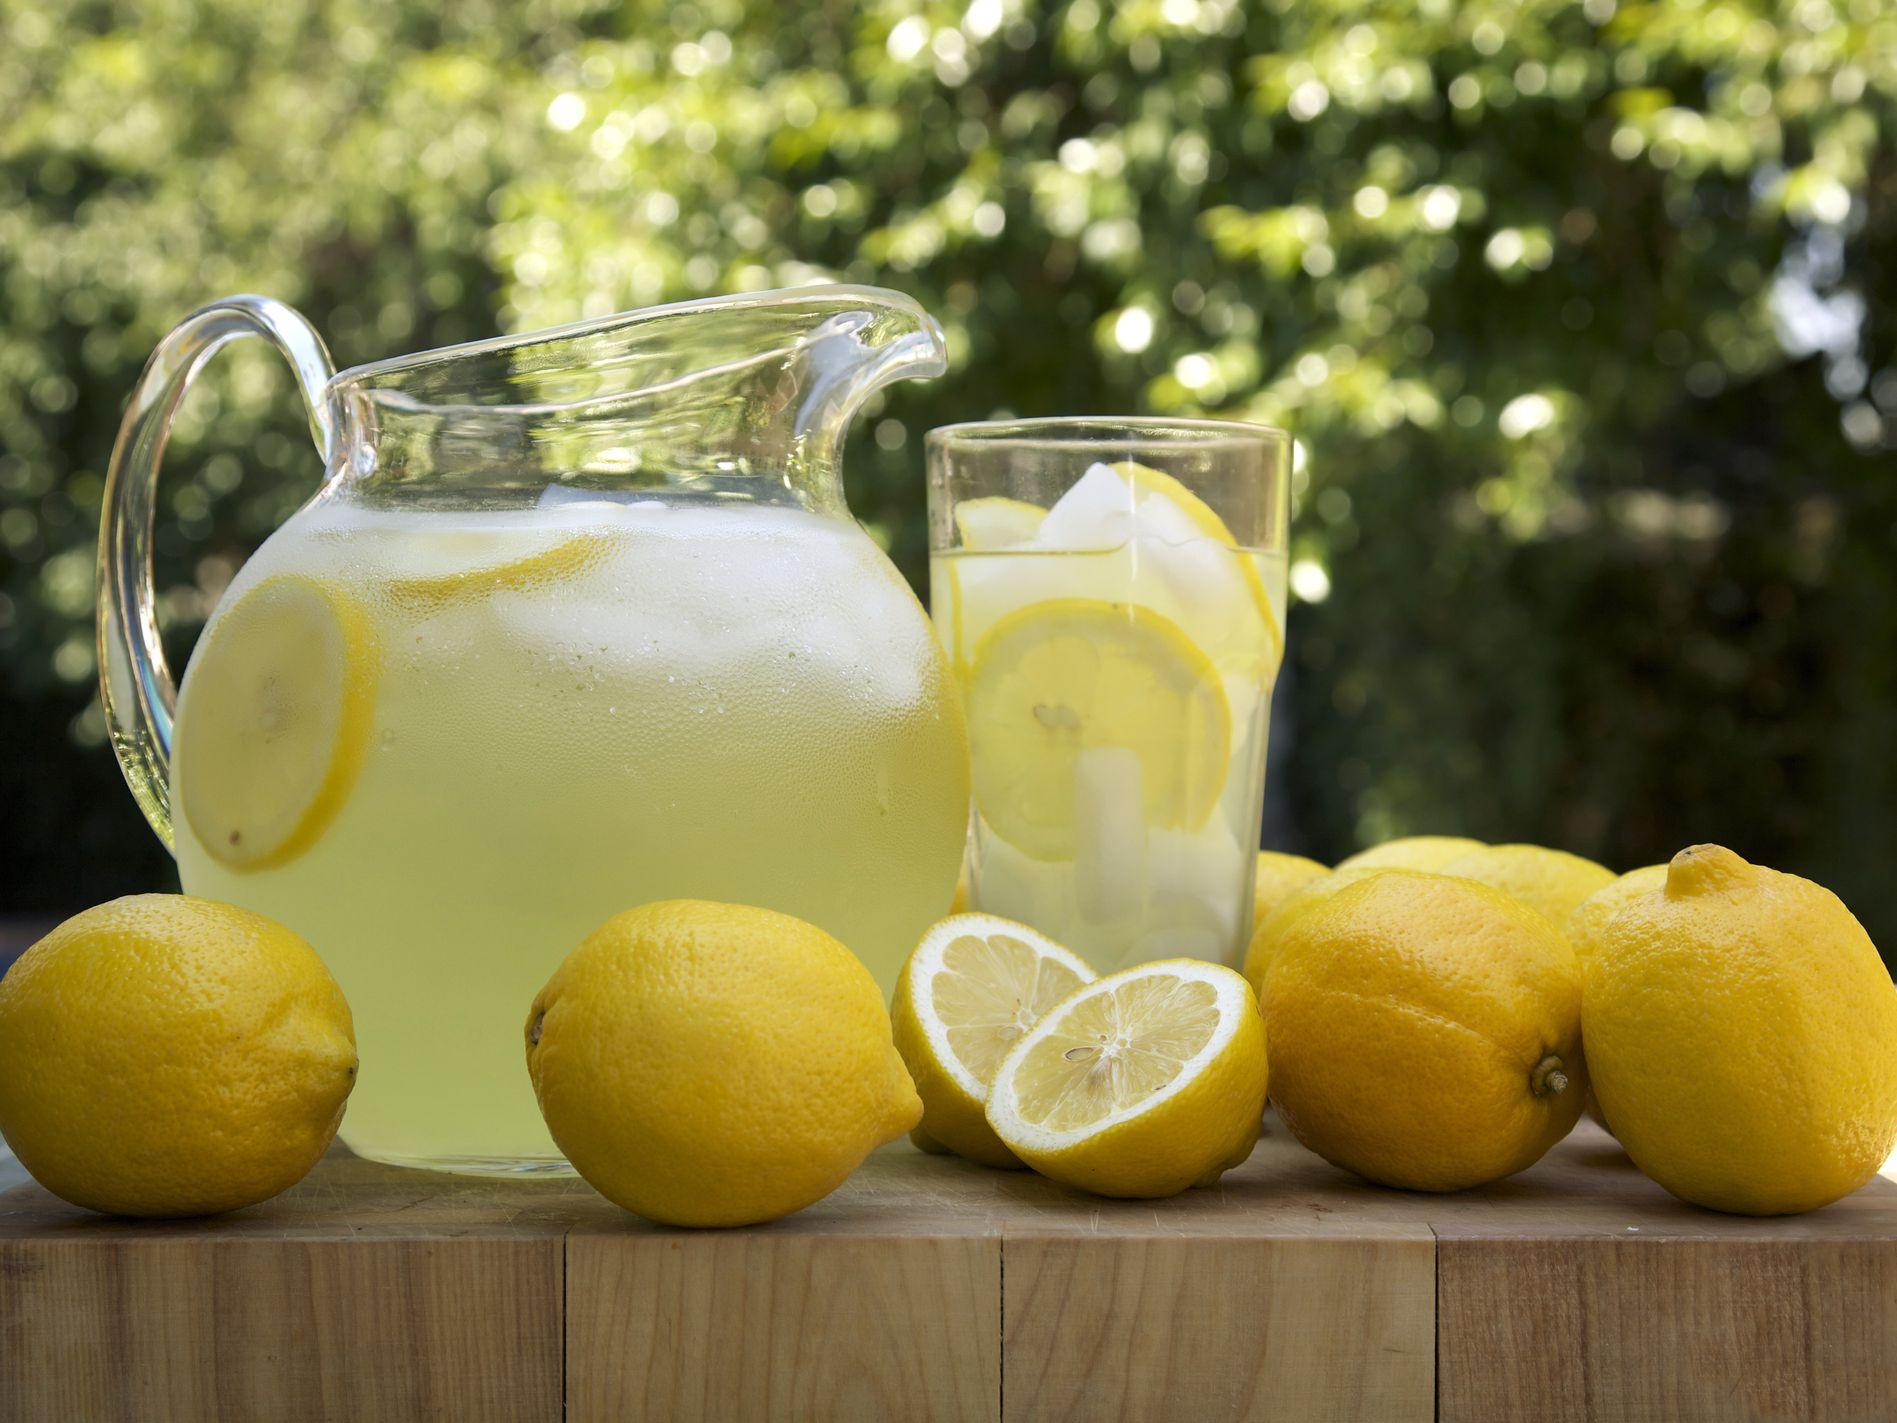 Homemade Lemonade Recipe With Variations